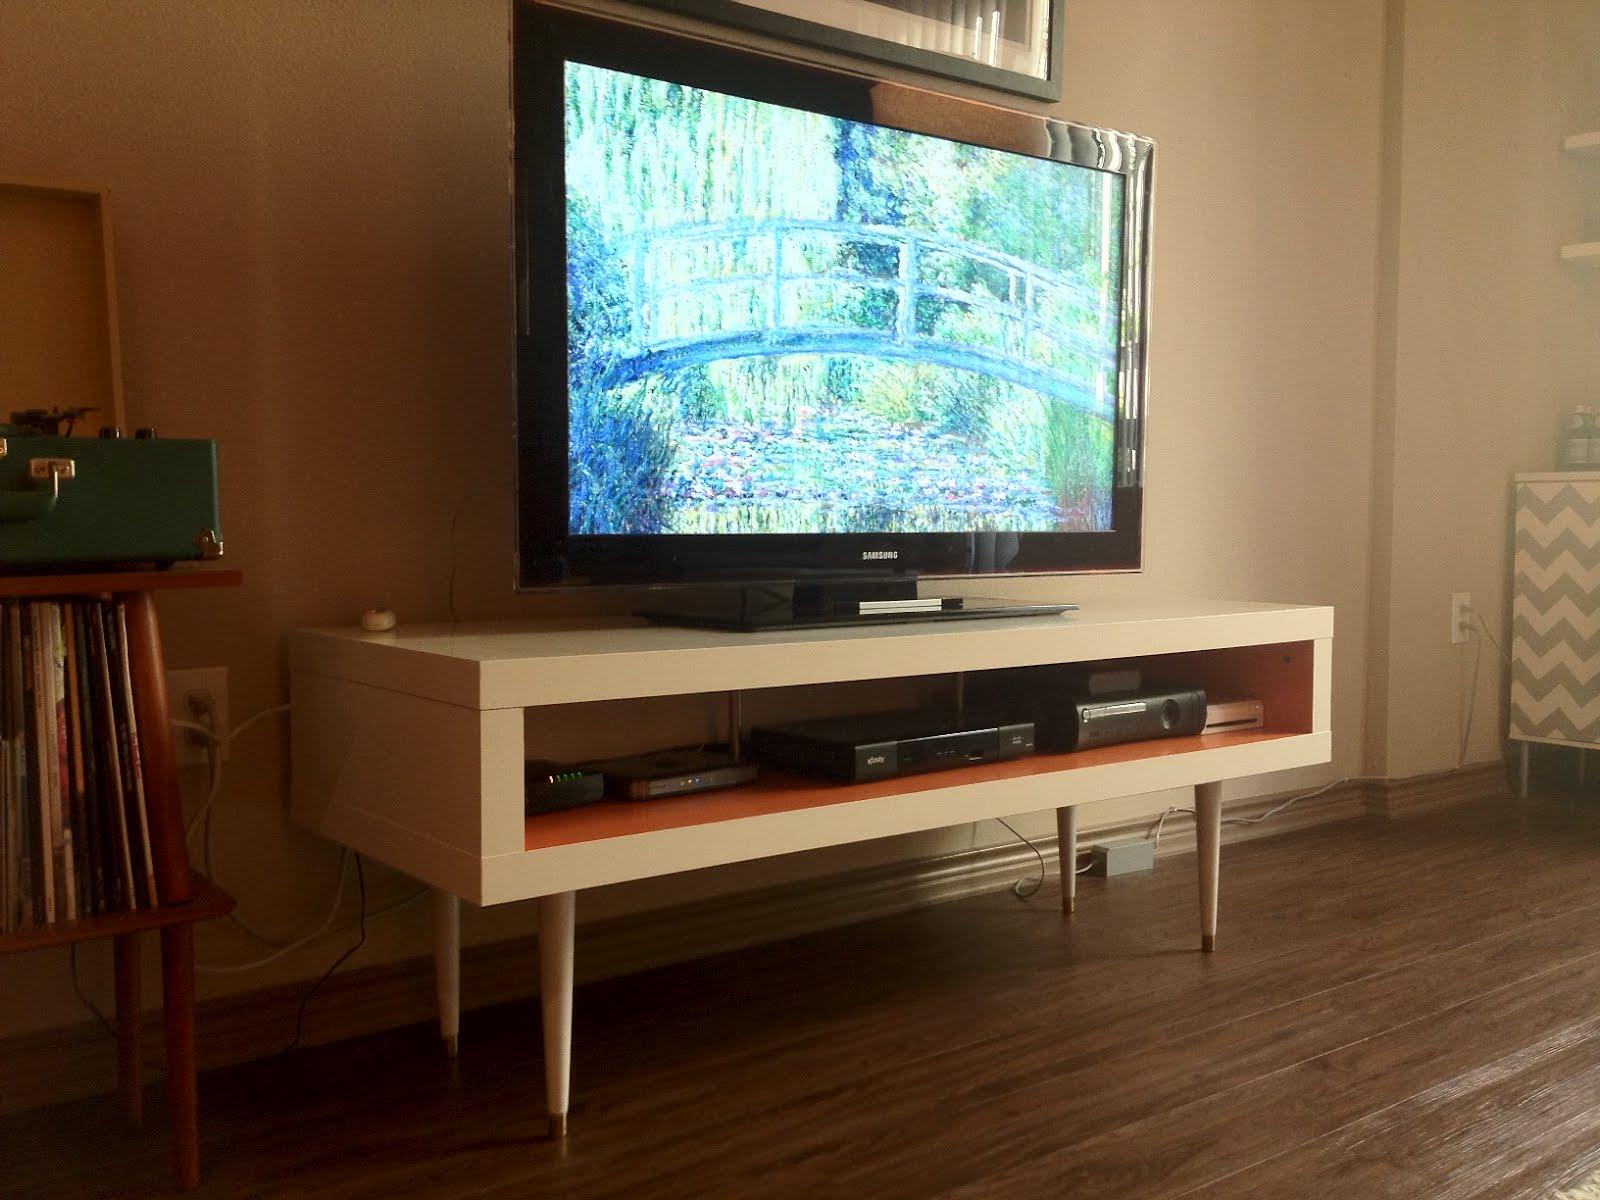 Meuble Tv Ikea Leksvik : Meuble Tv Expedit Ikea Mid Century Lack Tv Hack Ikea Hackers Ikea